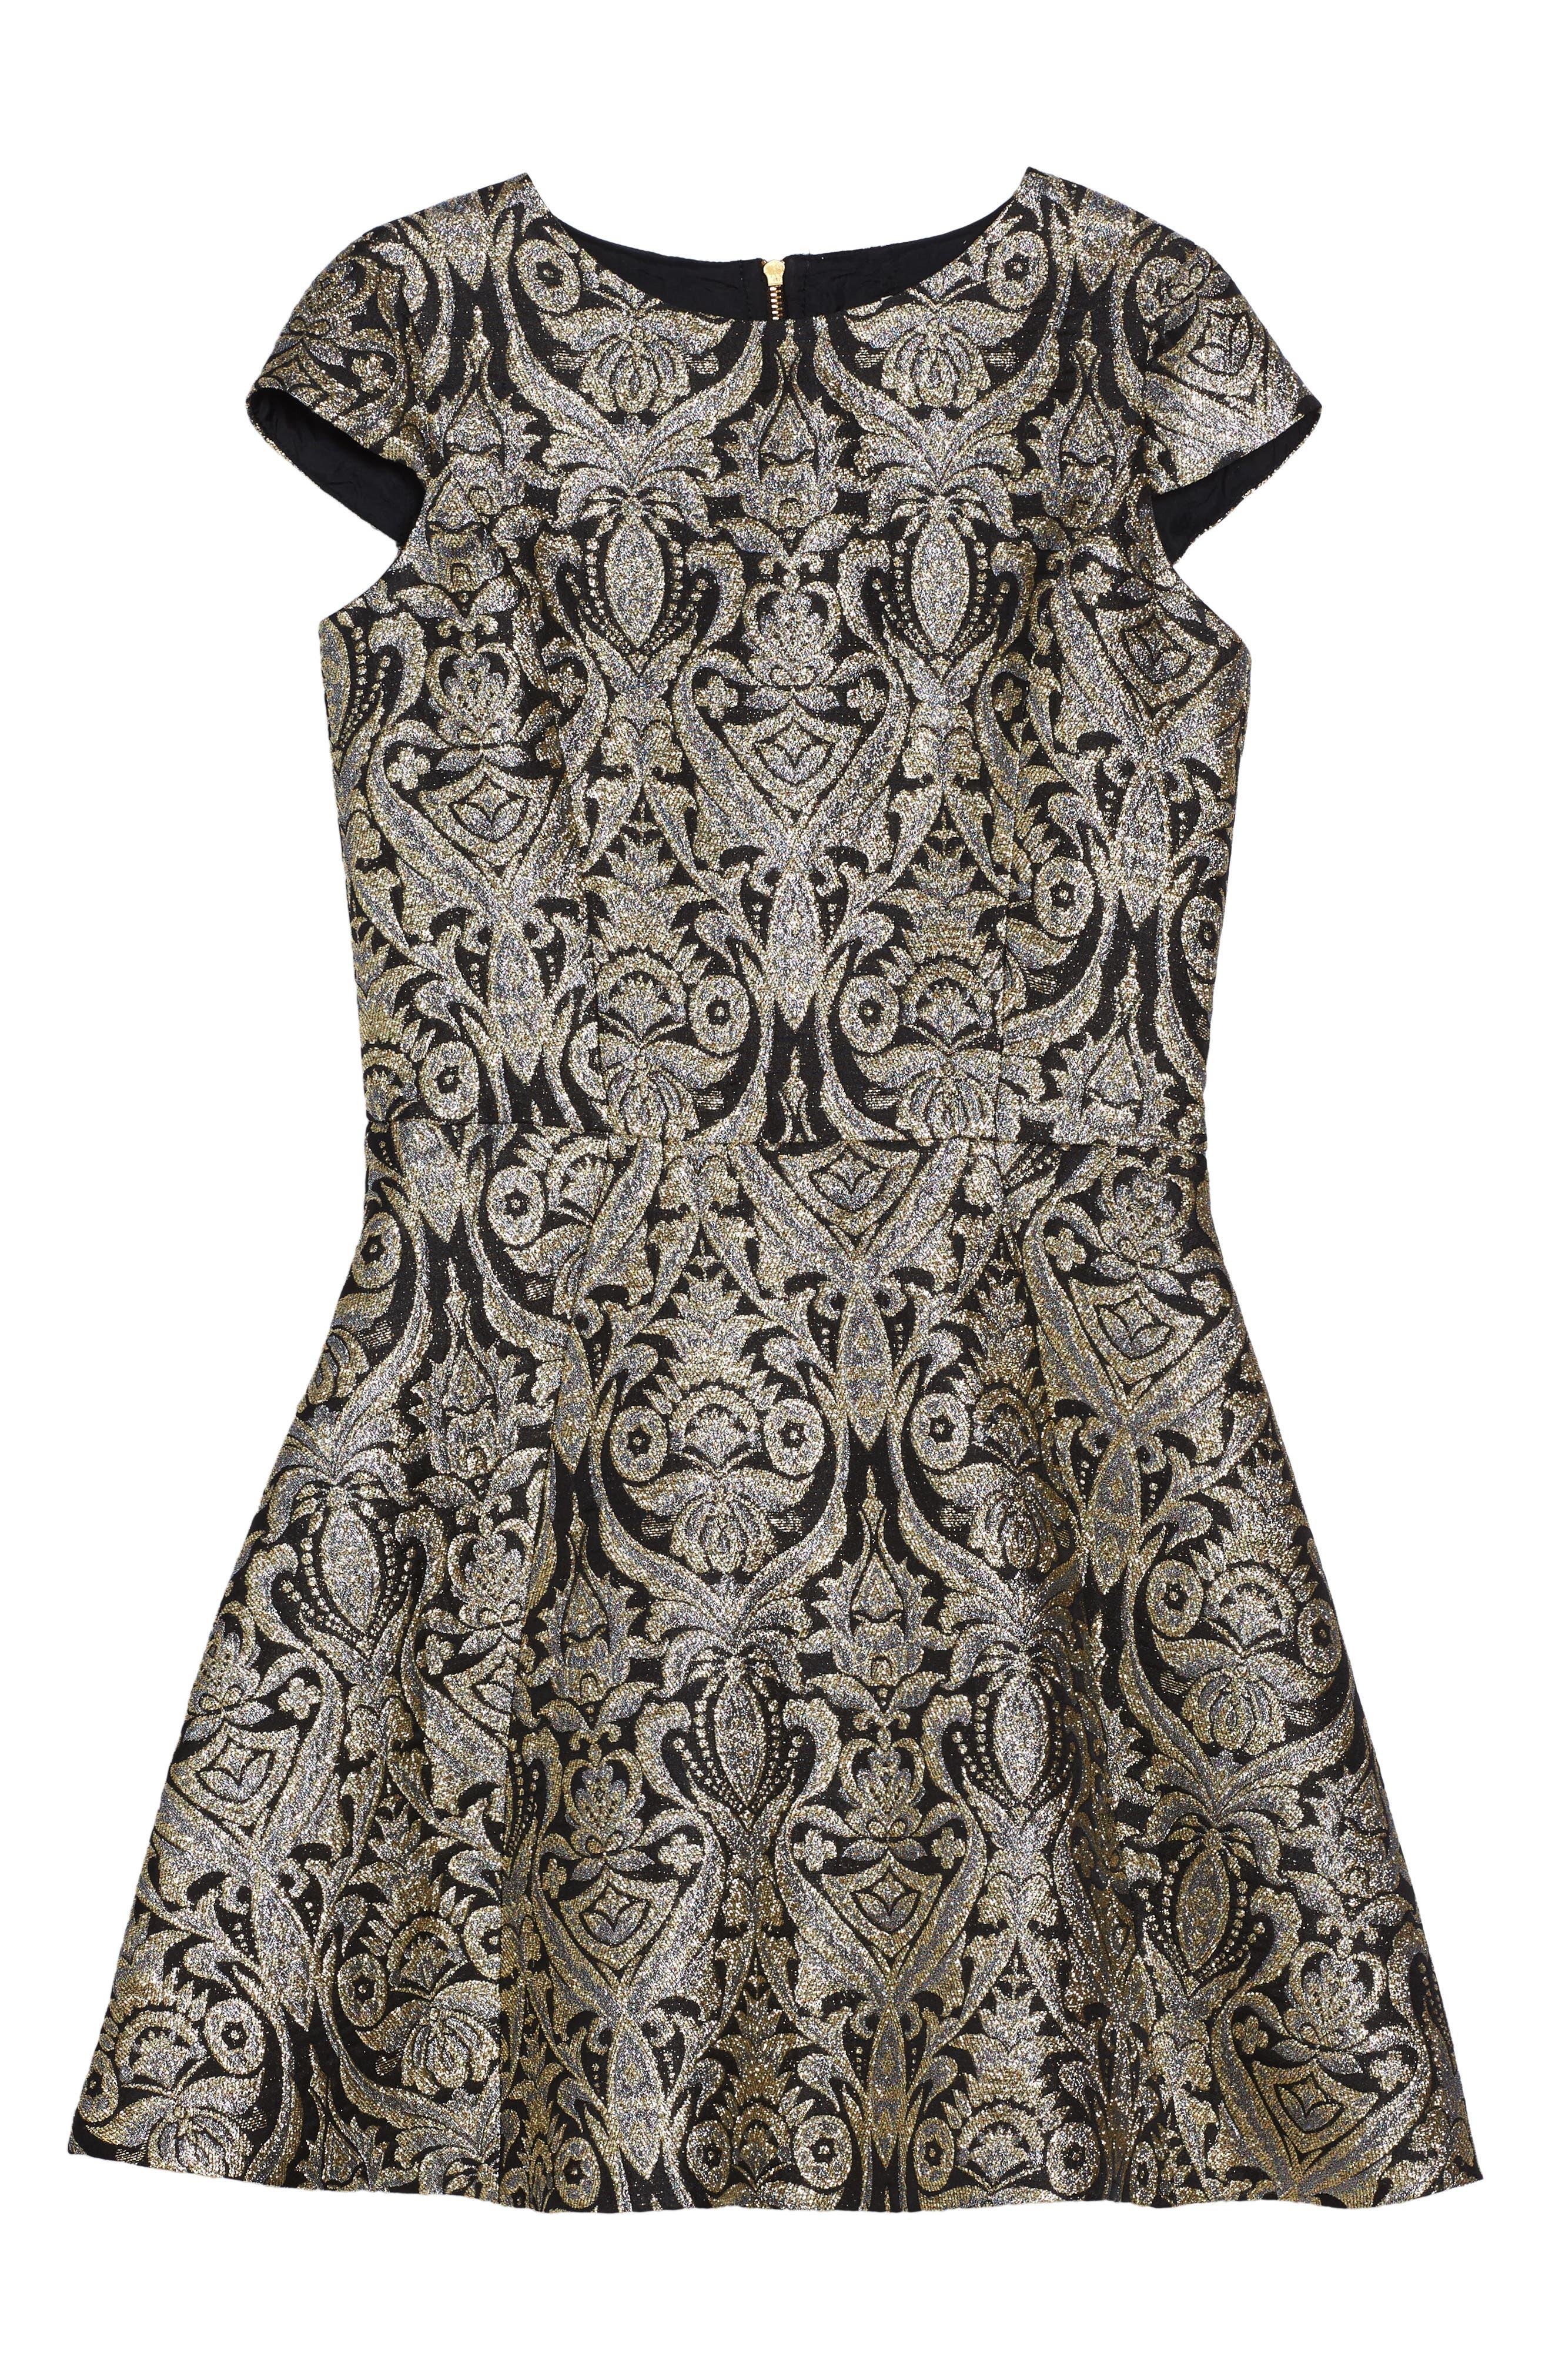 Alternate Image 1 Selected - David Charles Cap Sleeve Brocade Dress (Big Girls)